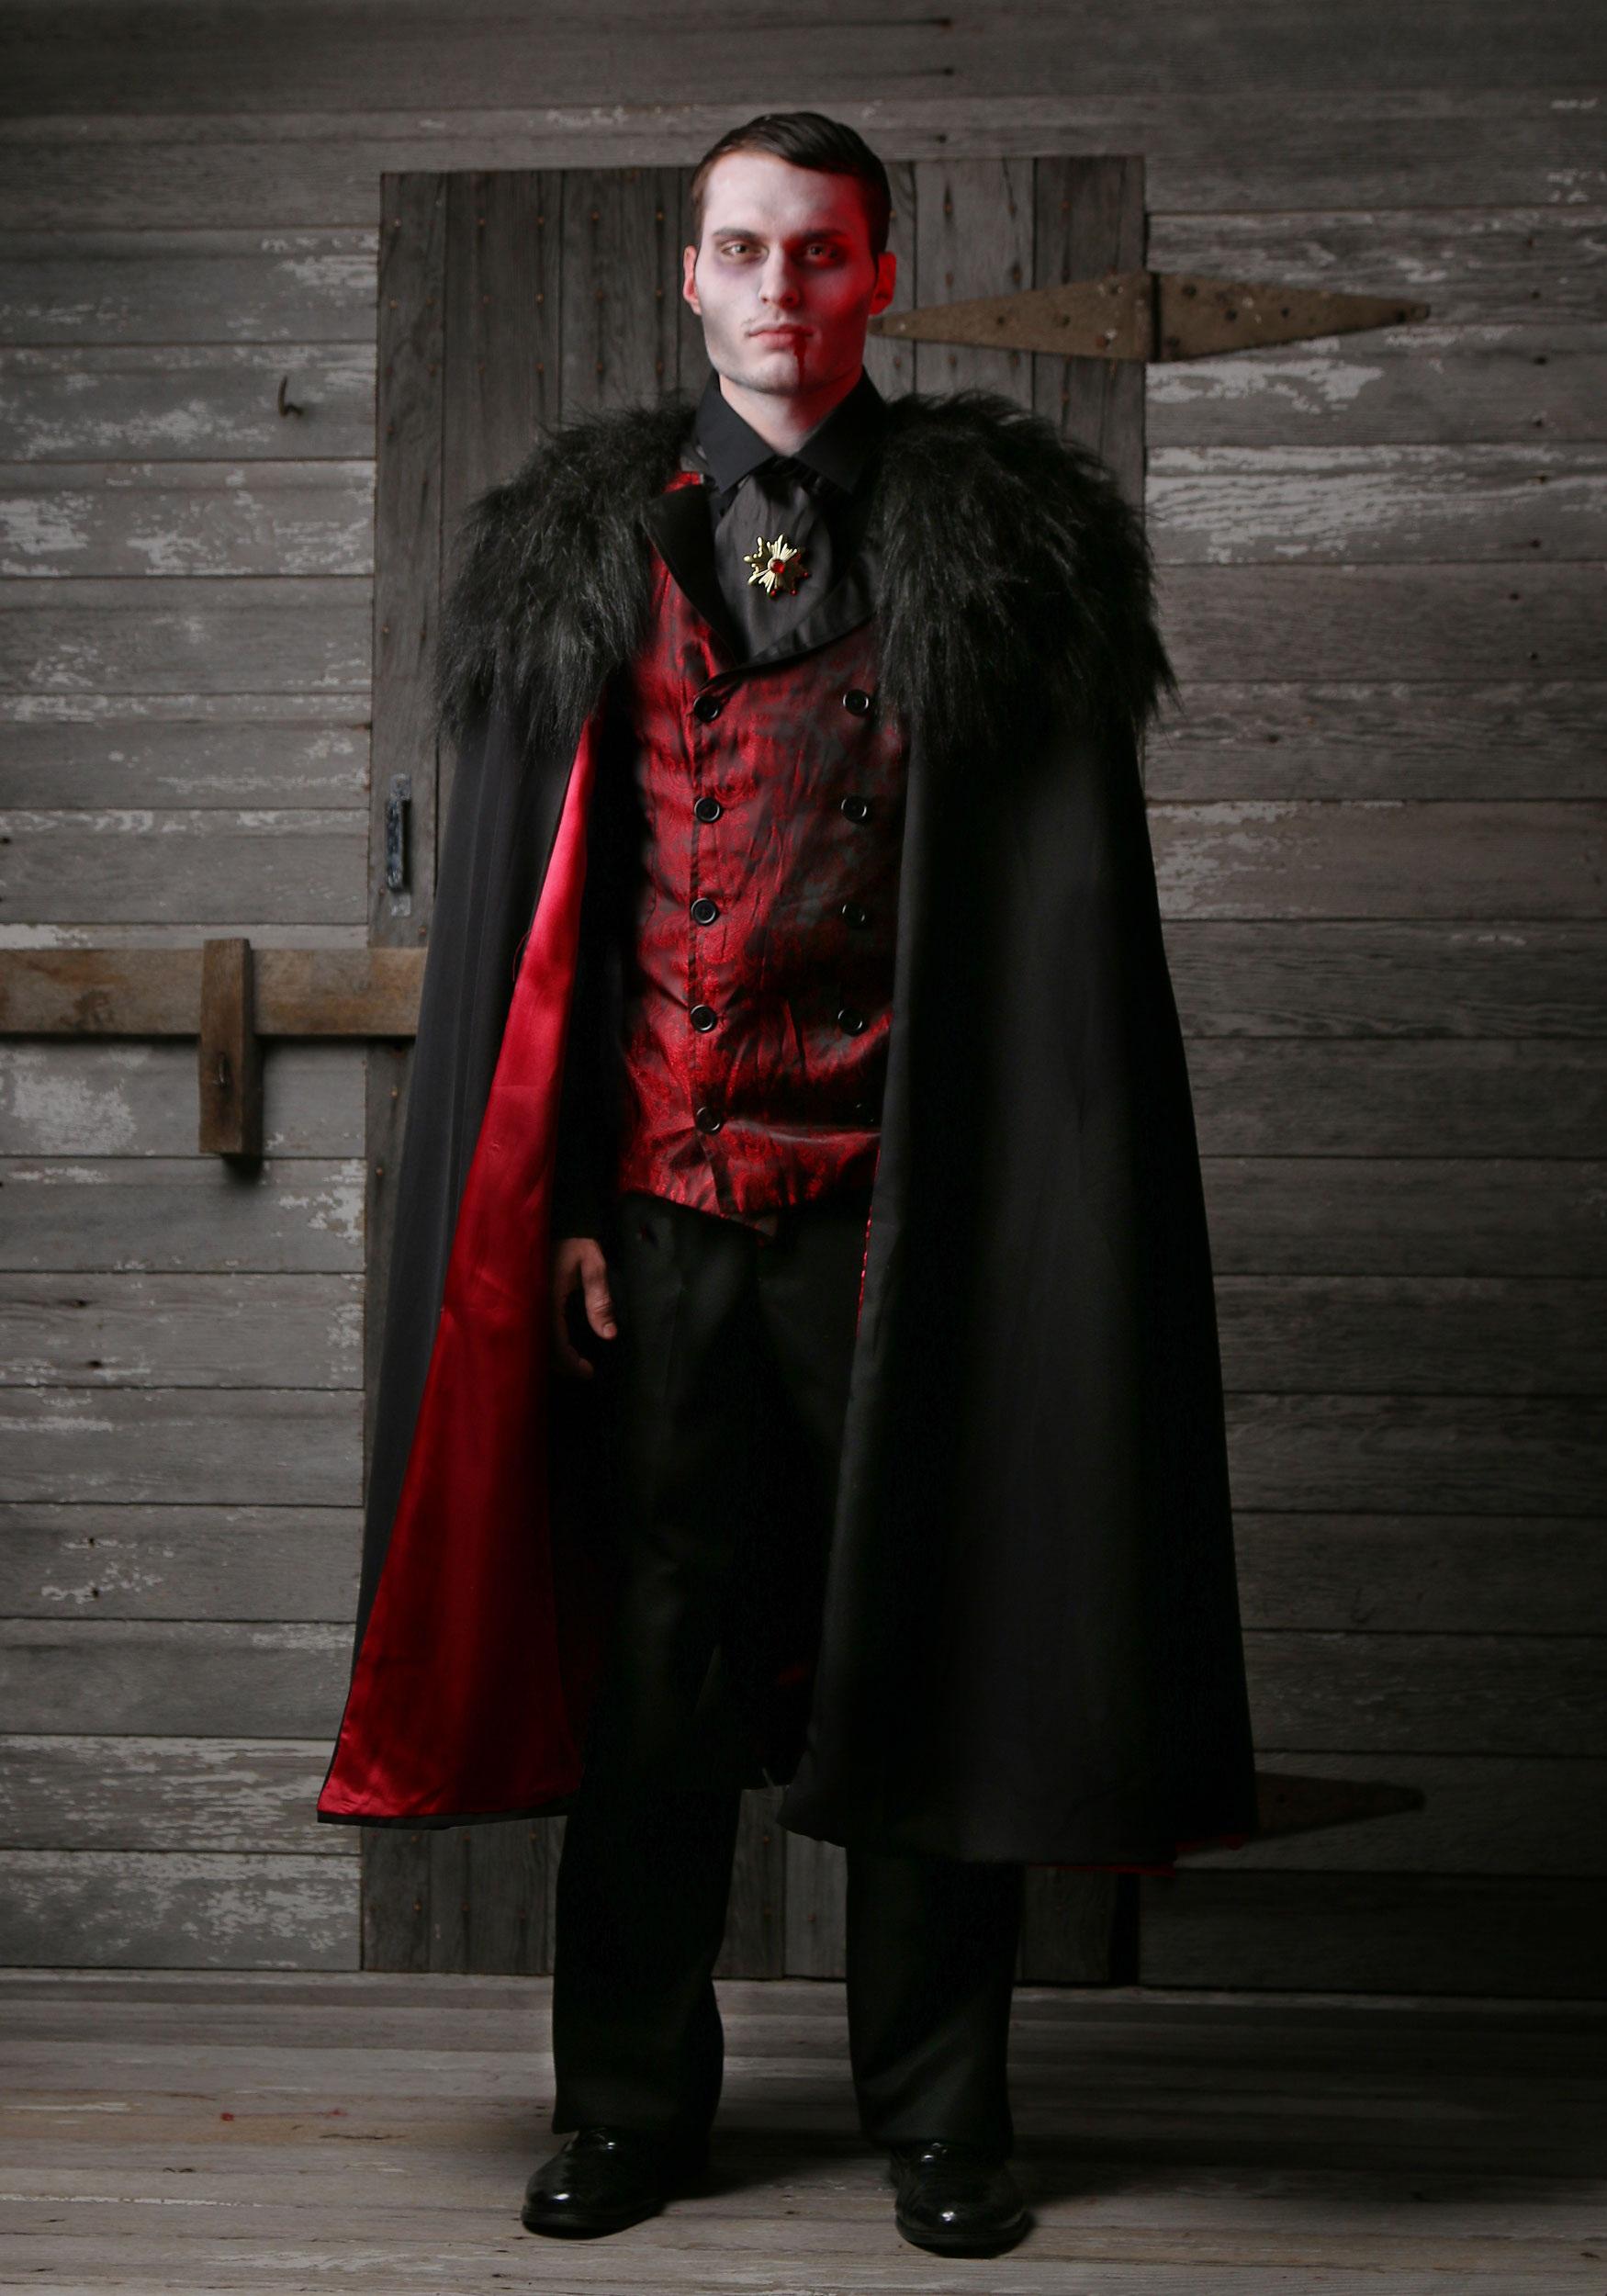 Sexy Vampire Costume Men : vampire, costume, Deluxe, Men's, Vampire, Costume